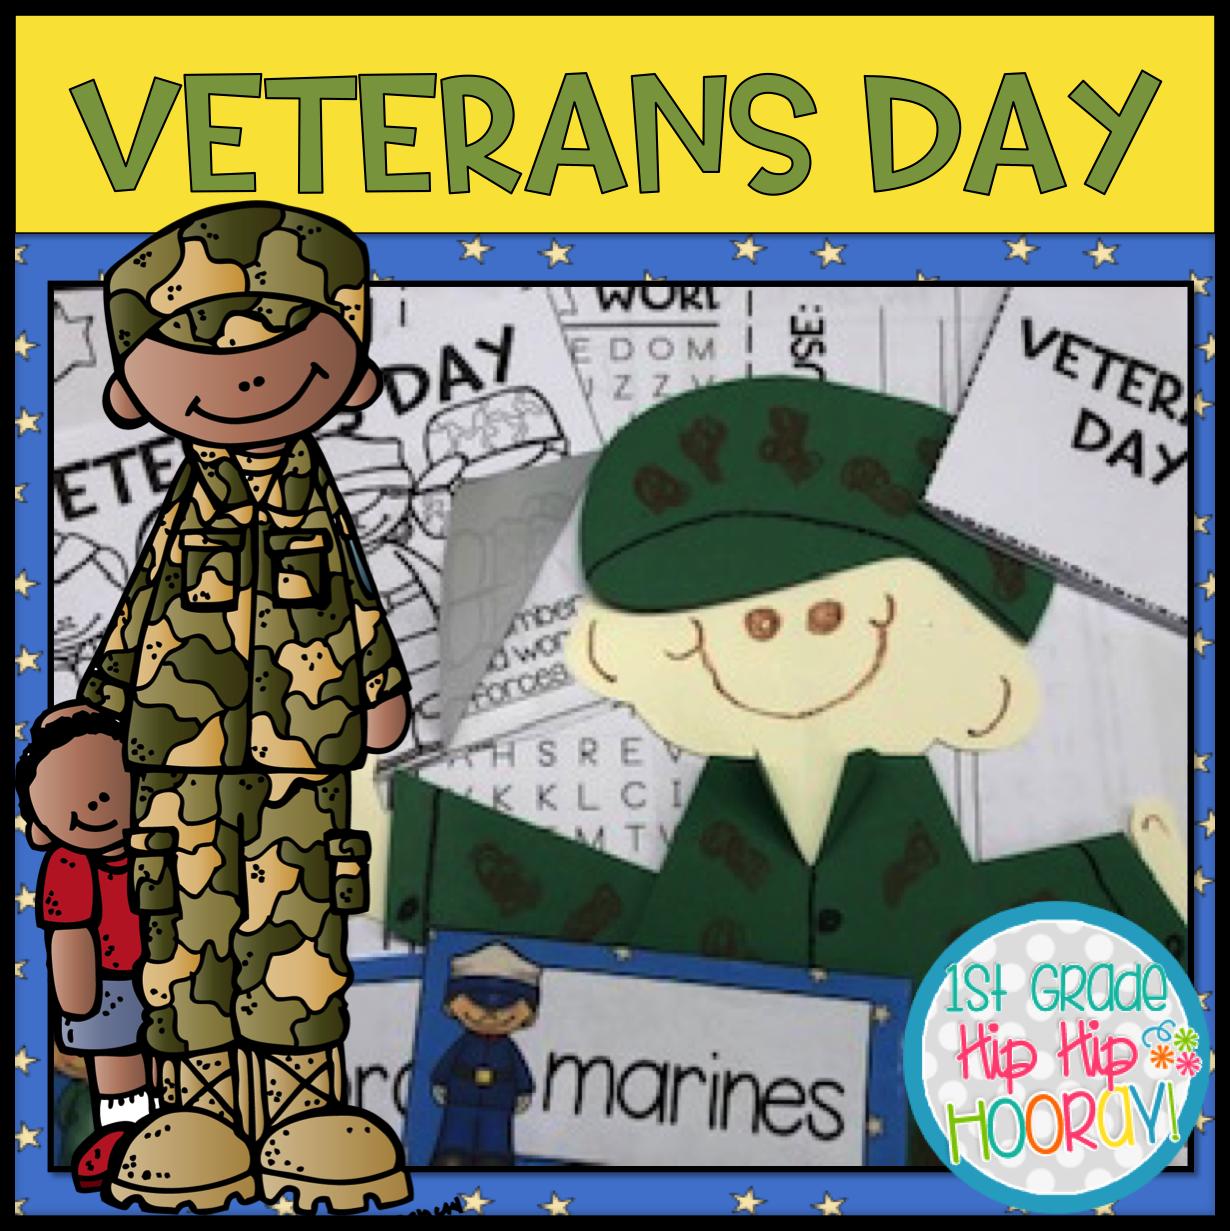 1st Grade Hip Hip Hooray Veterans Day Aft And Activities